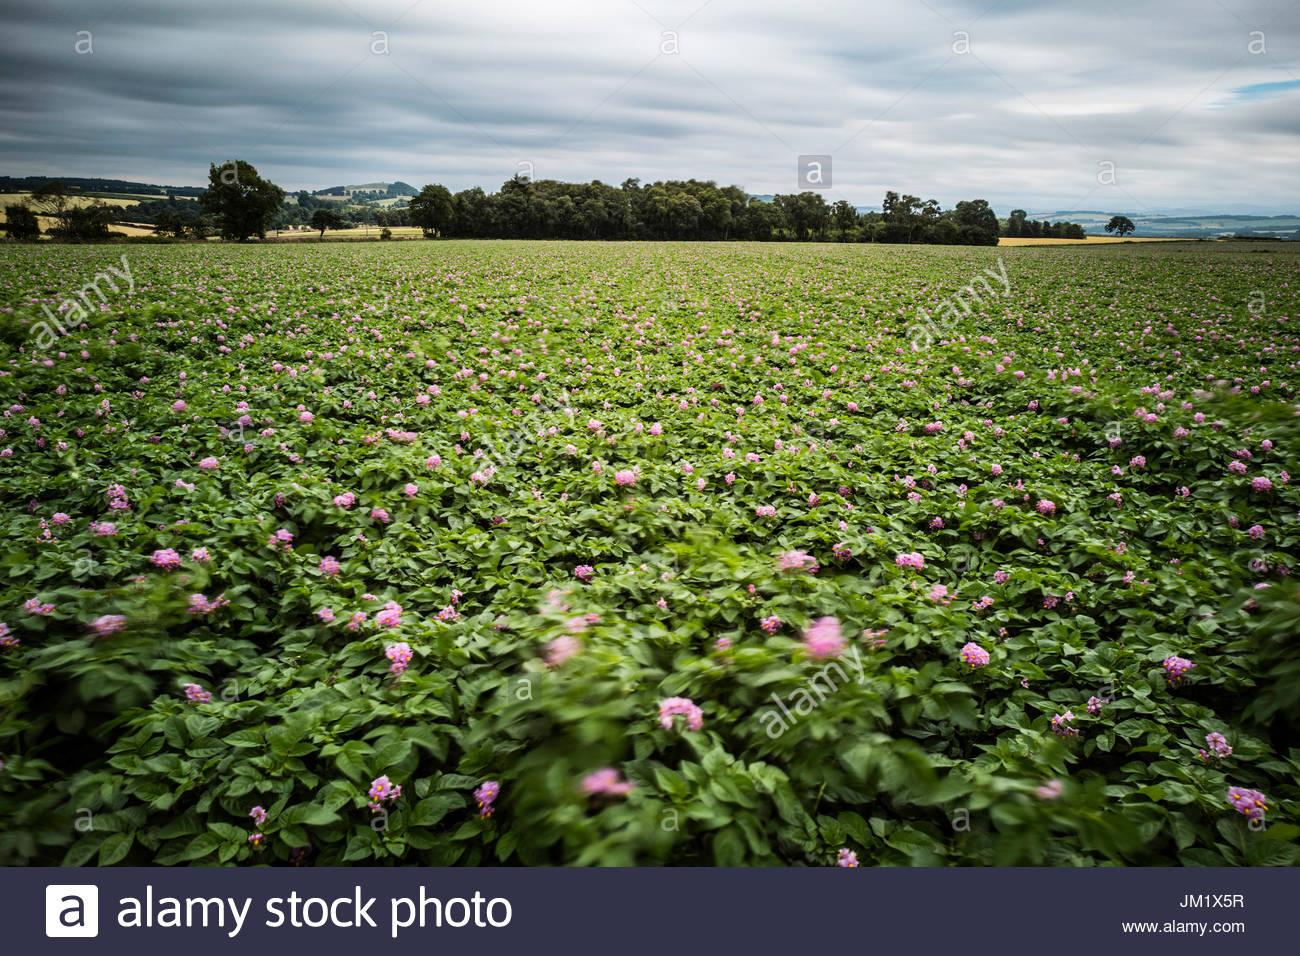 Purple Flower Potato Stock Photos & Purple Flower Potato ...